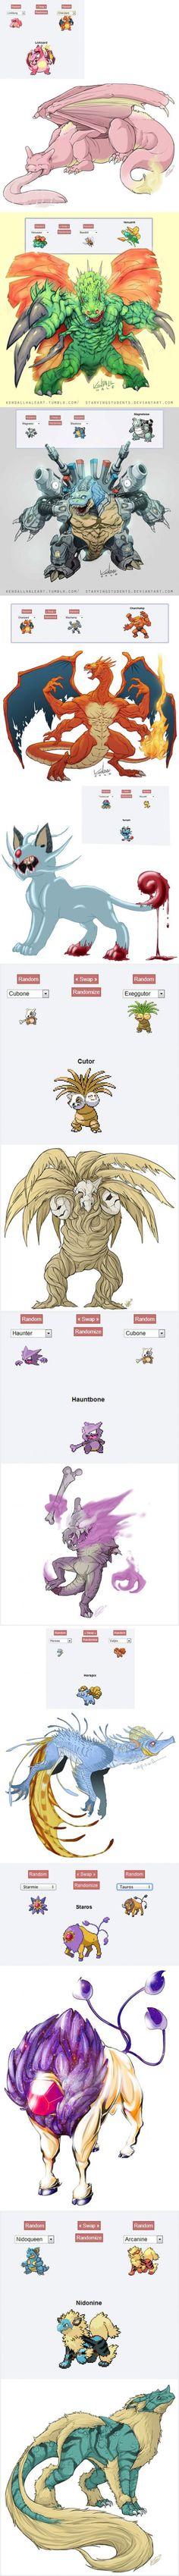 Pokemon fusion!